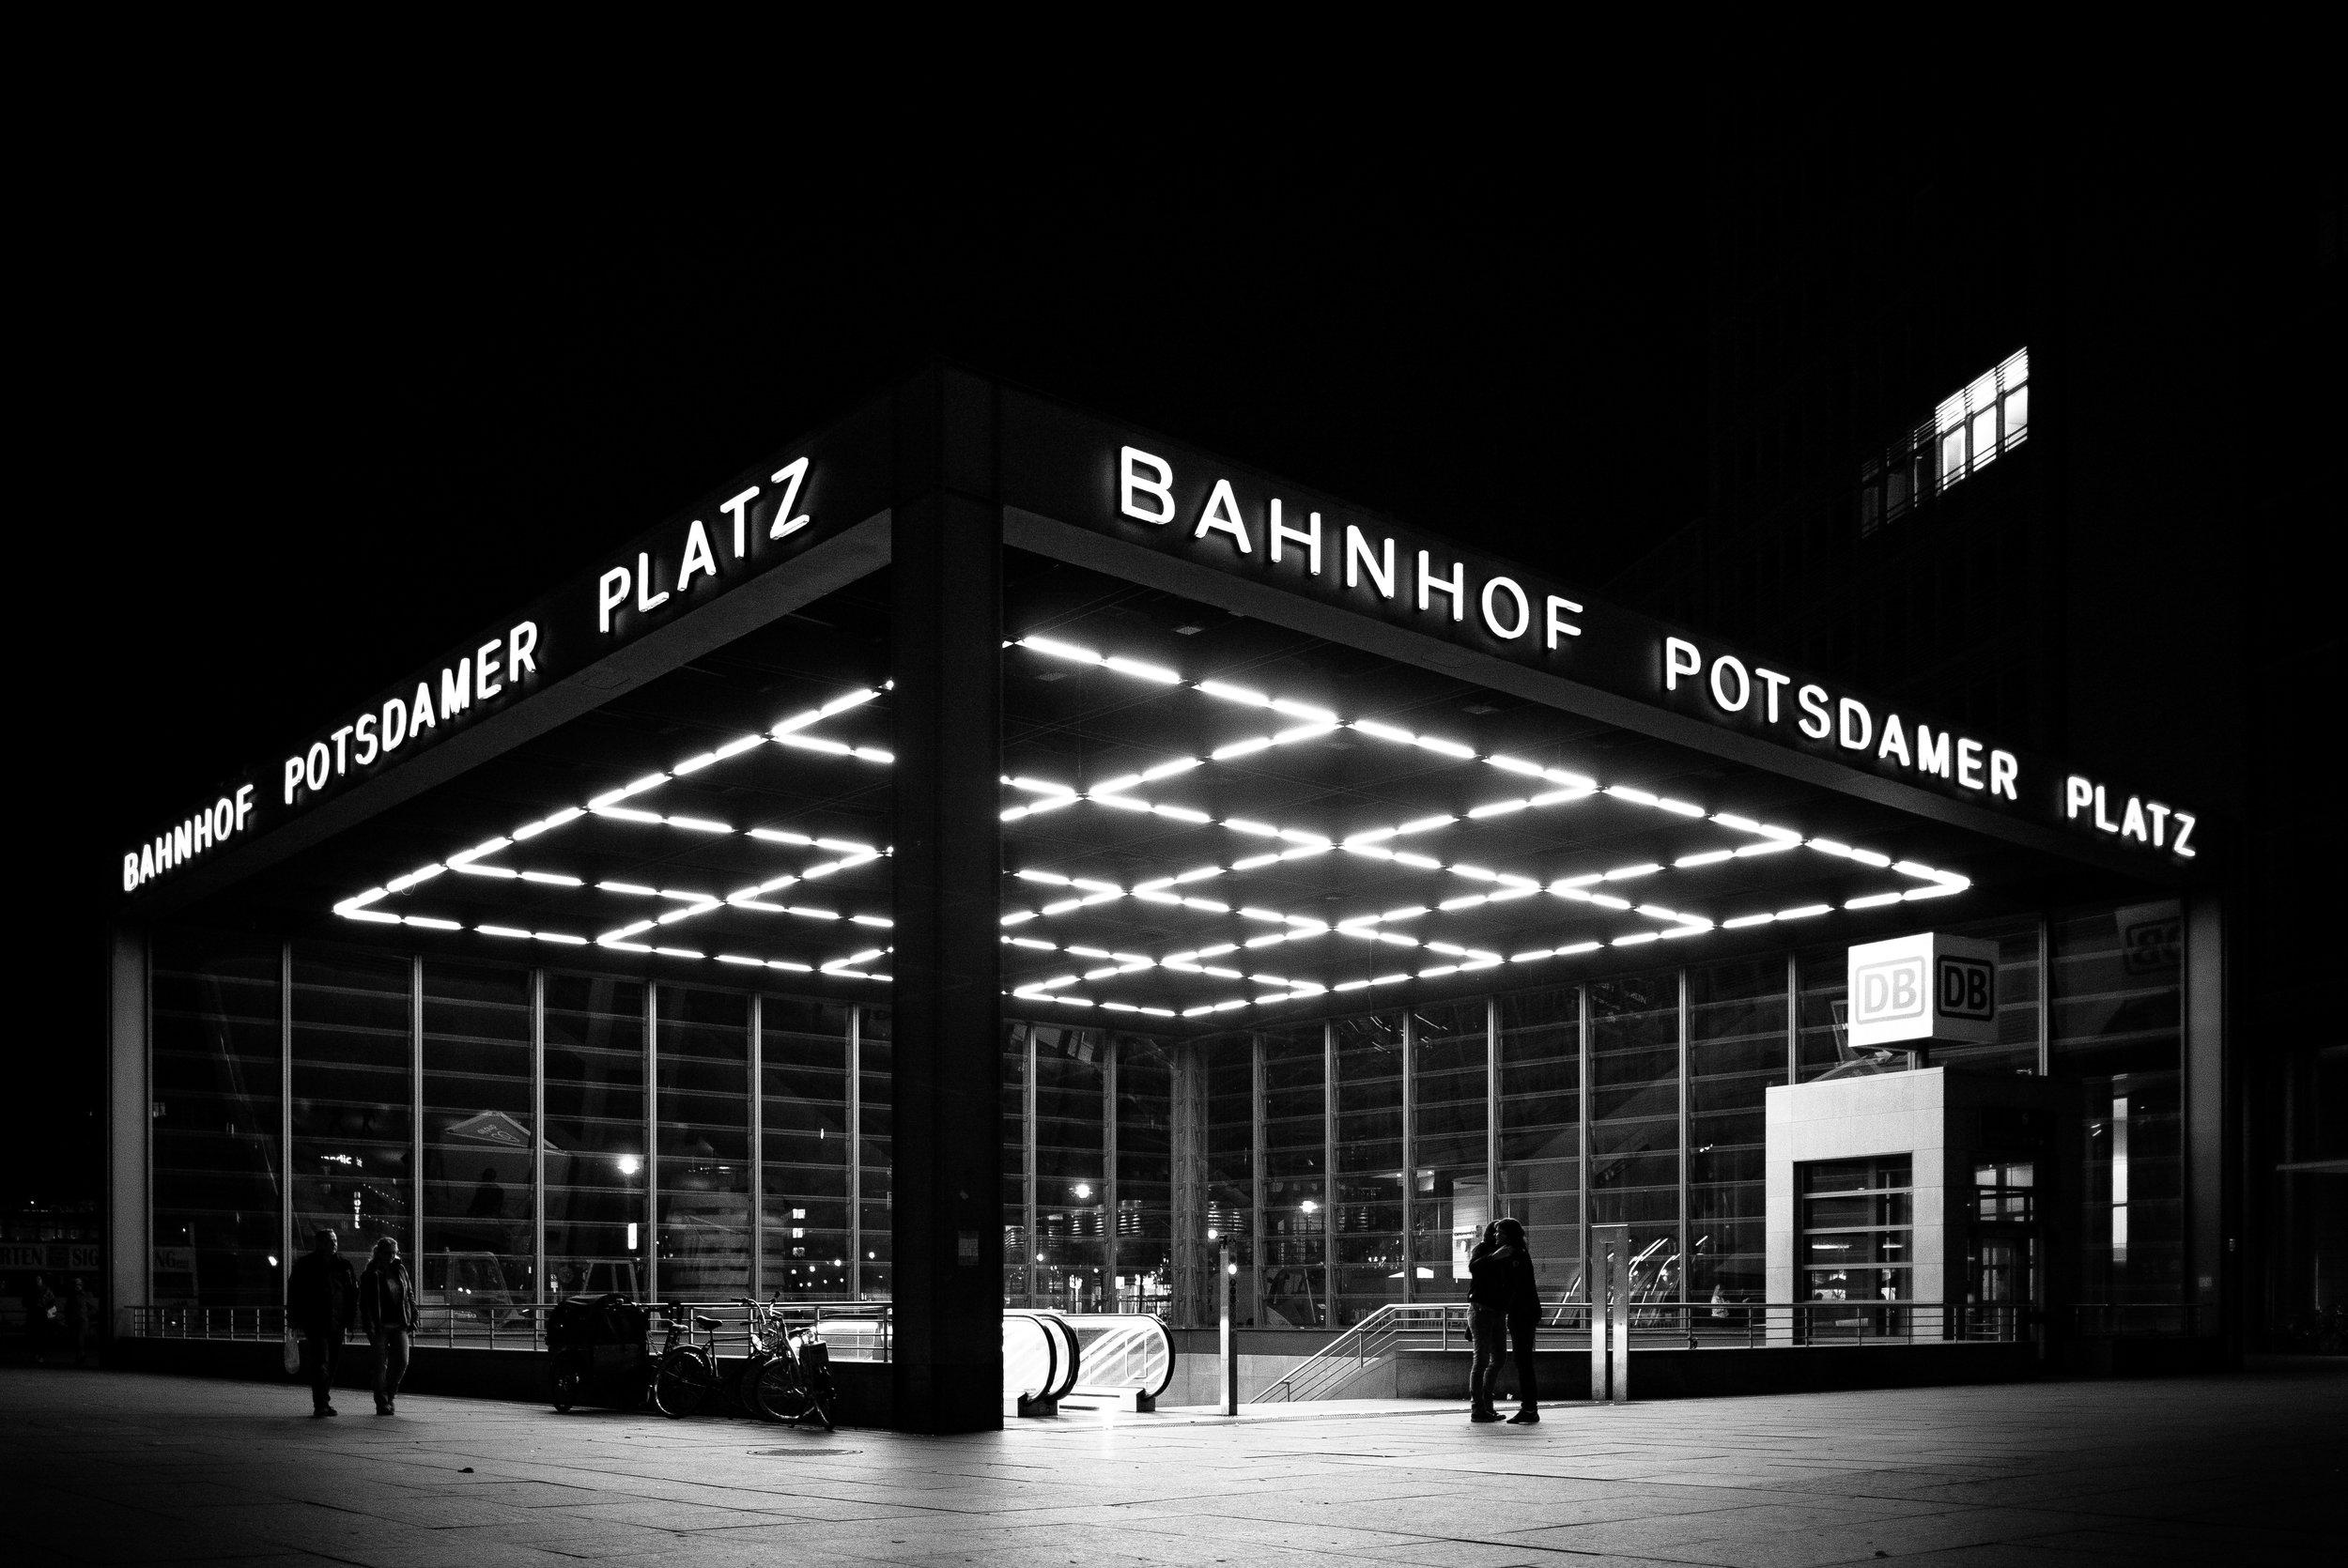 Bahnhof Potsdamer Platz, Berlin. Germany. 2018.